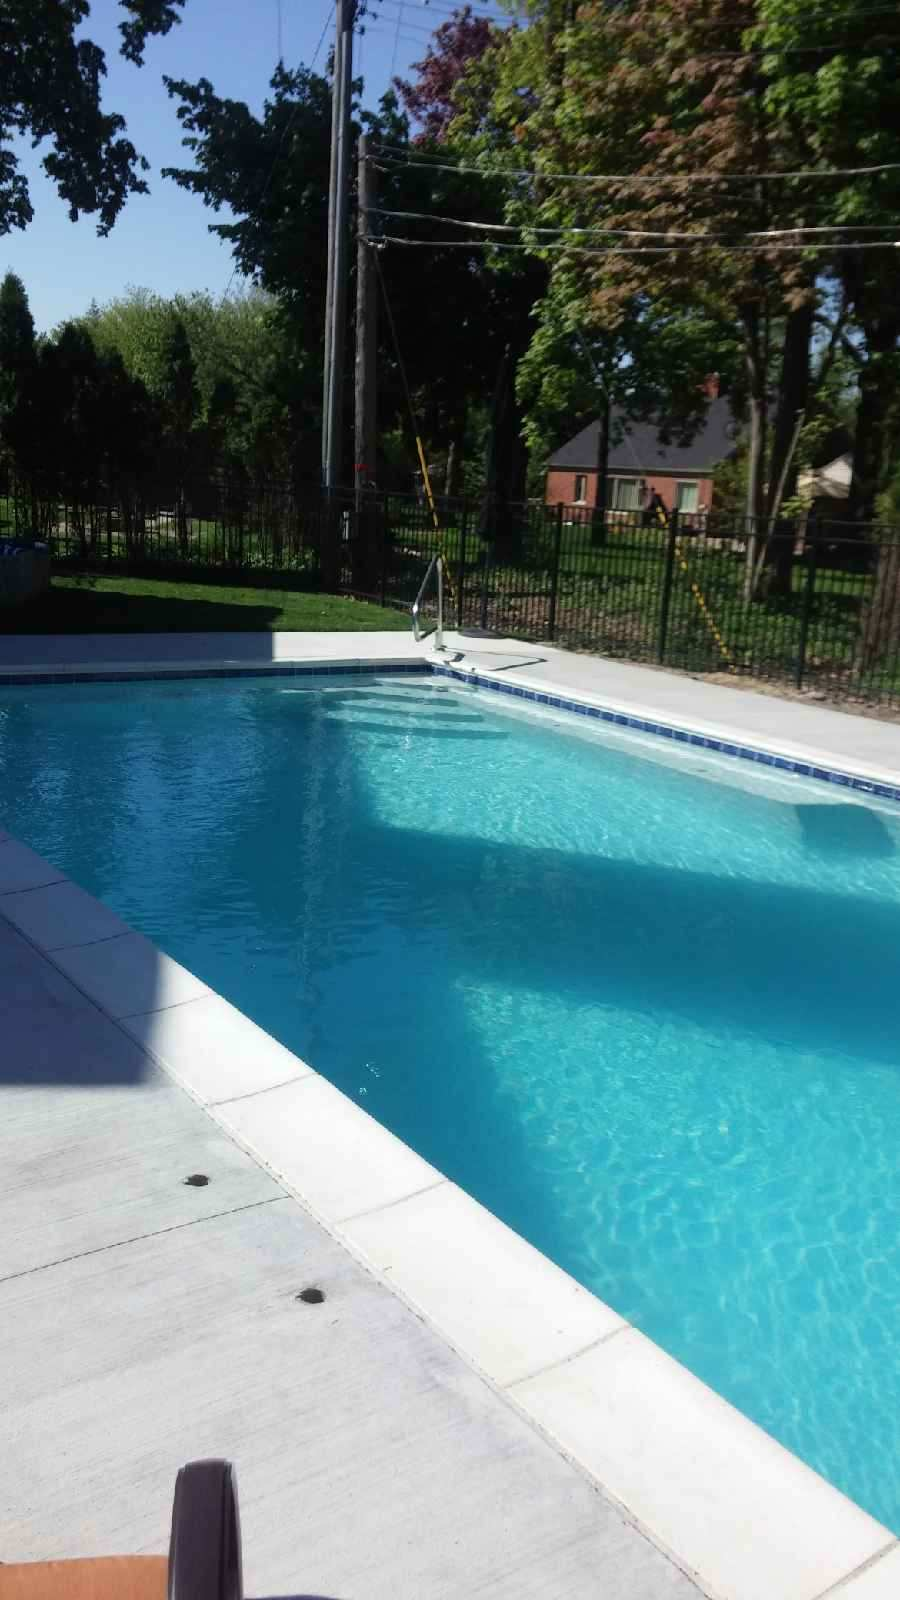 prestige-pools_michigan_pool-remodel_pool-renovation_new-pool_4.jpg